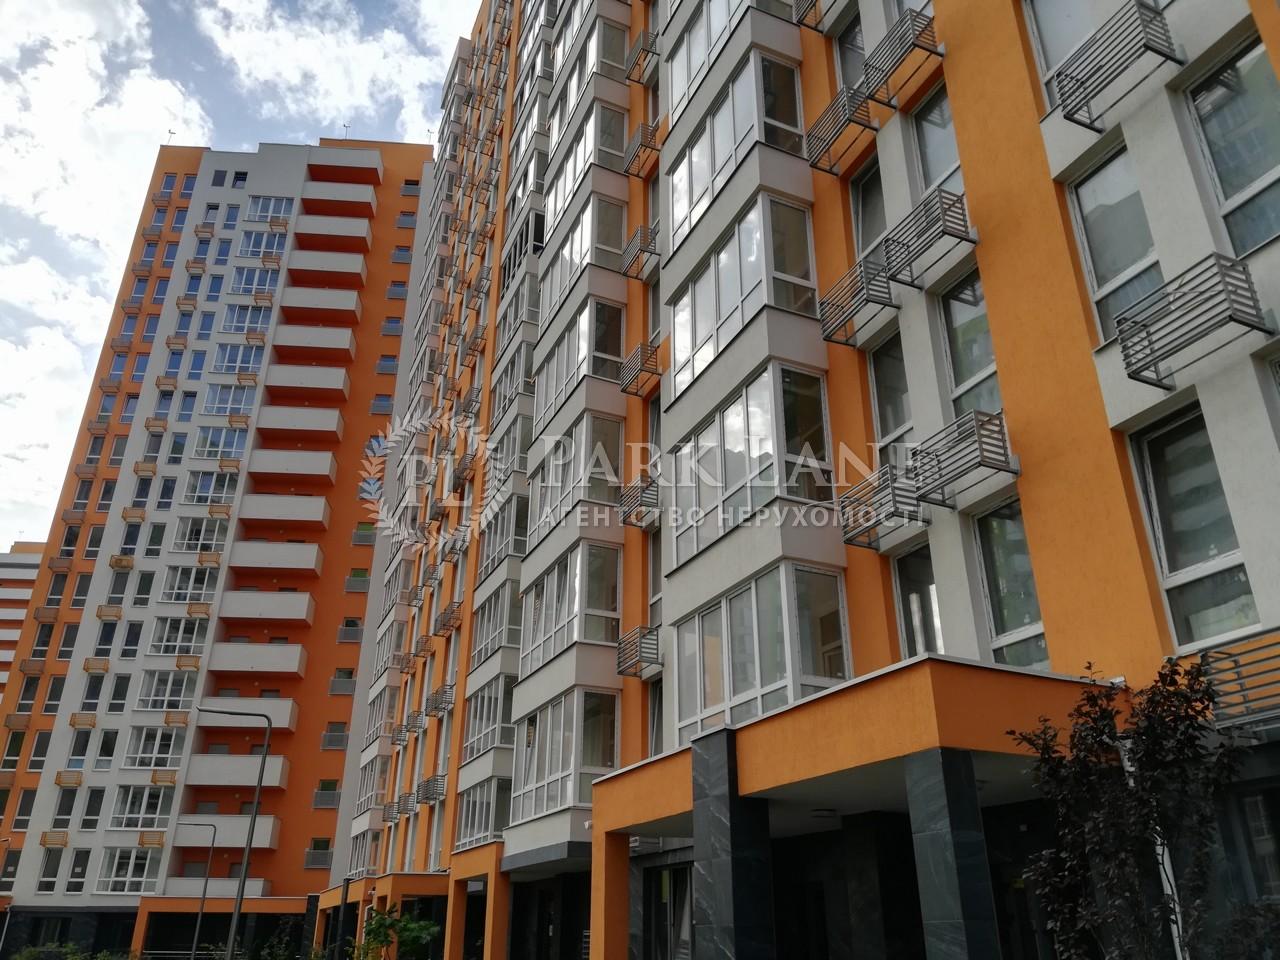 Квартира R-38743, Победы просп., 67 корпус 5, Киев - Фото 3